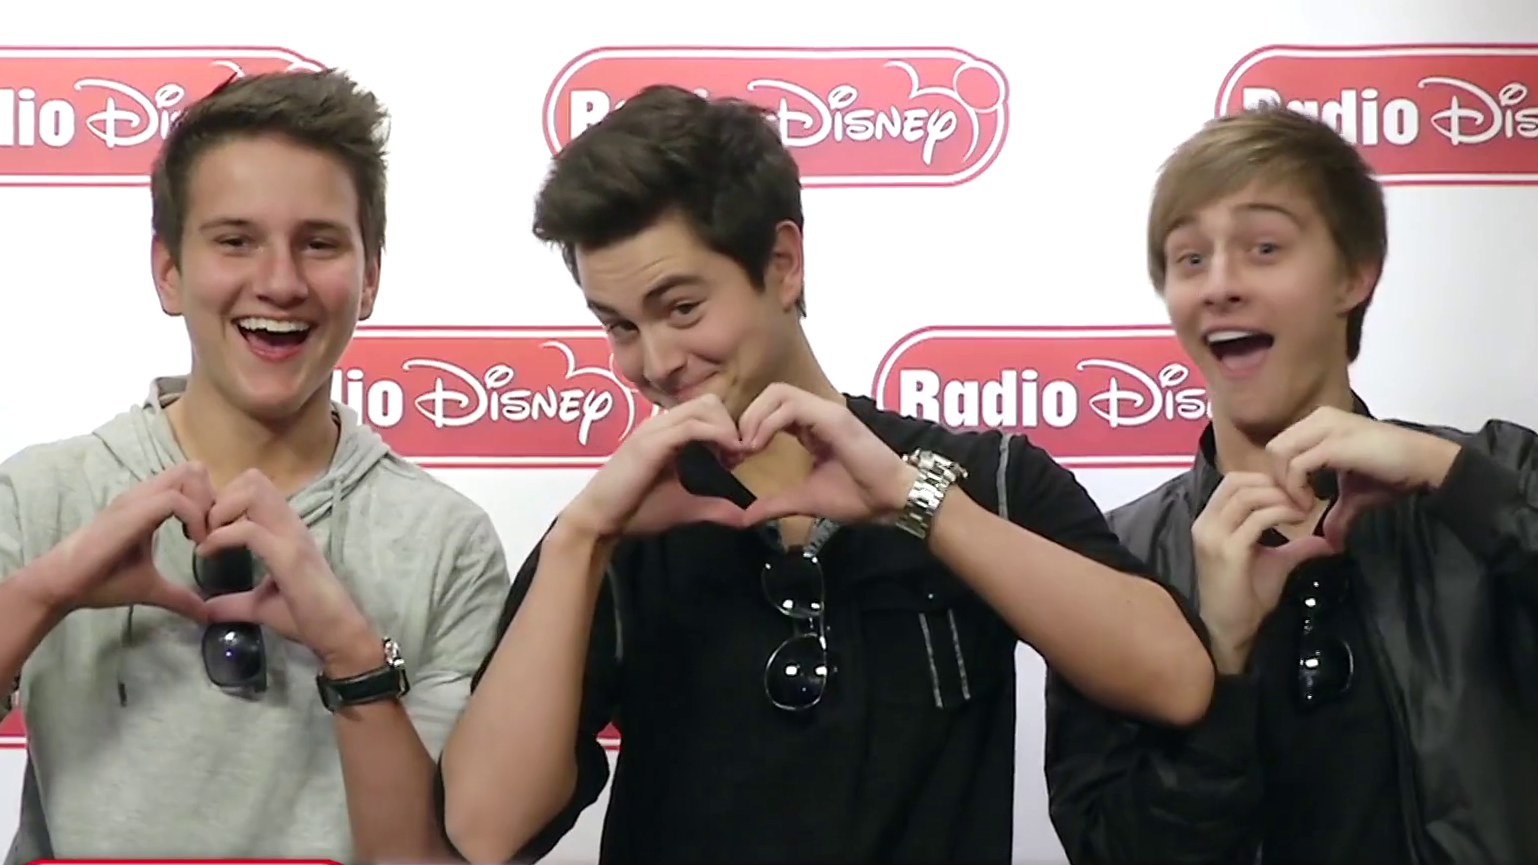 Valentine's Day - Radio Disney Greeting